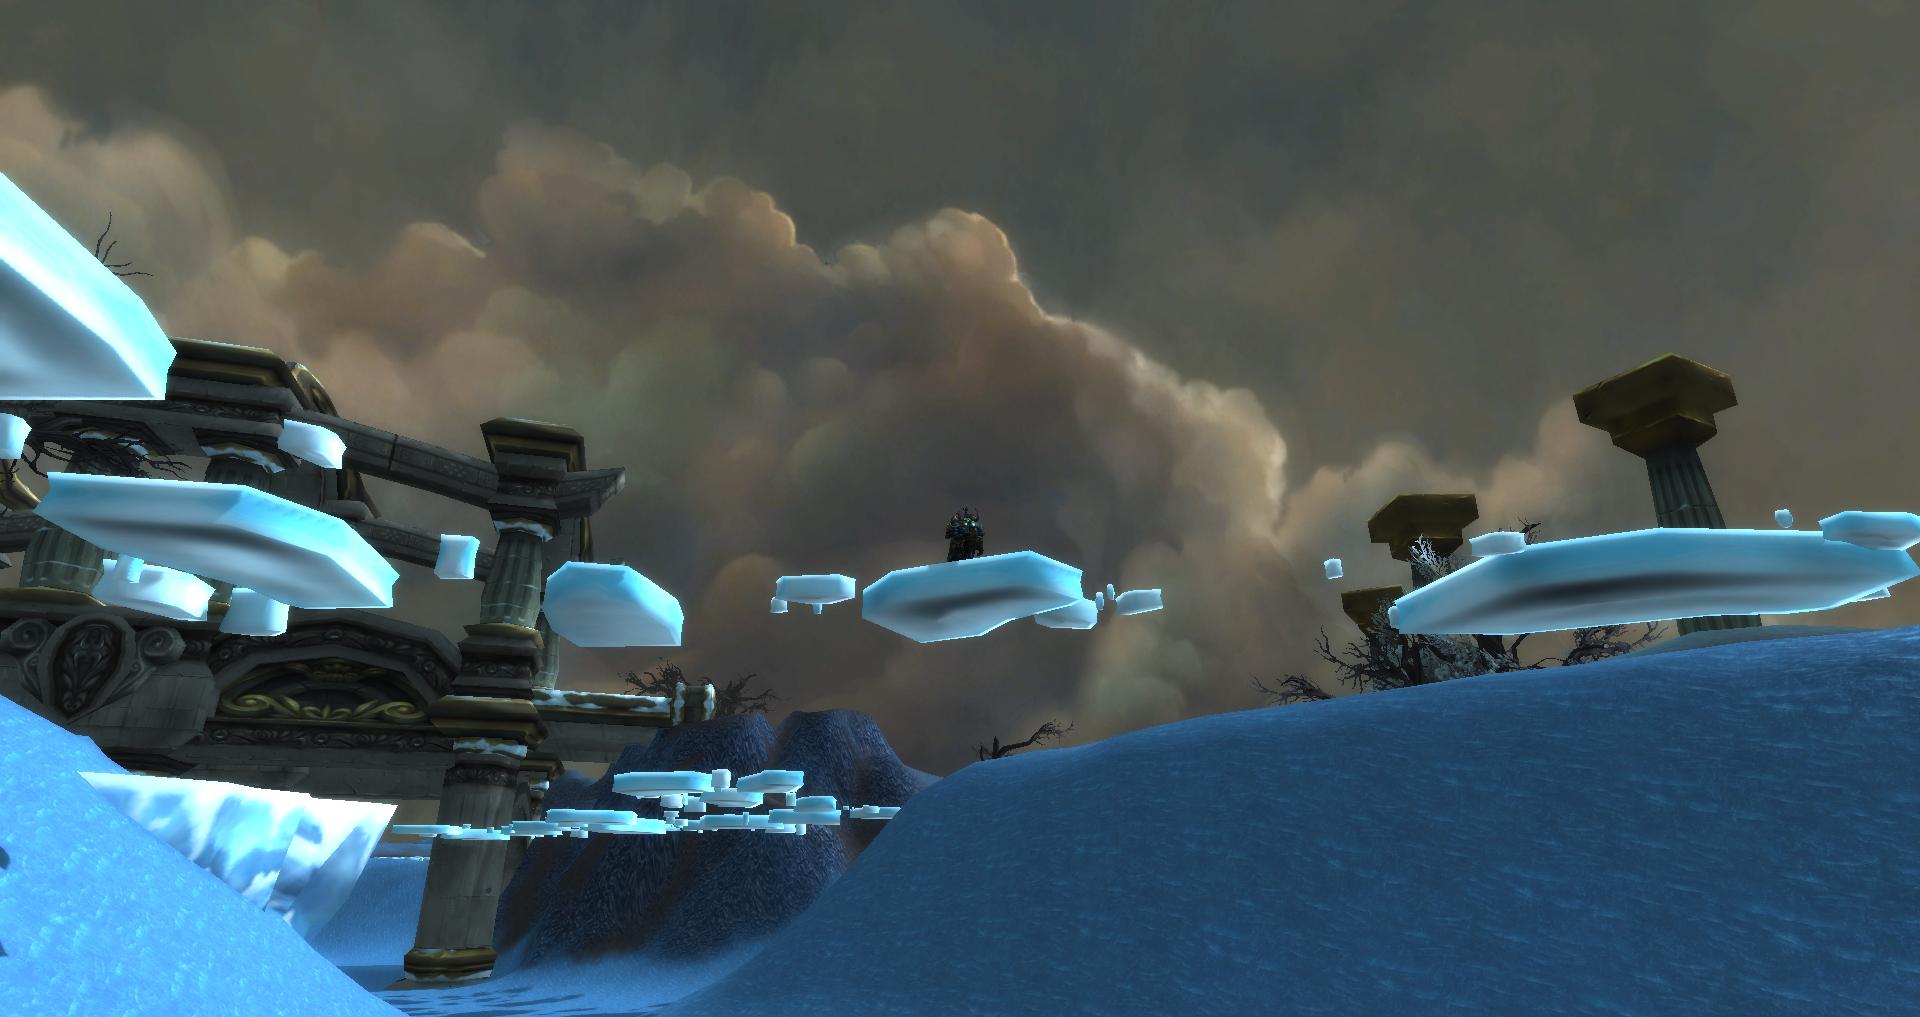 wintergrasp iceberg